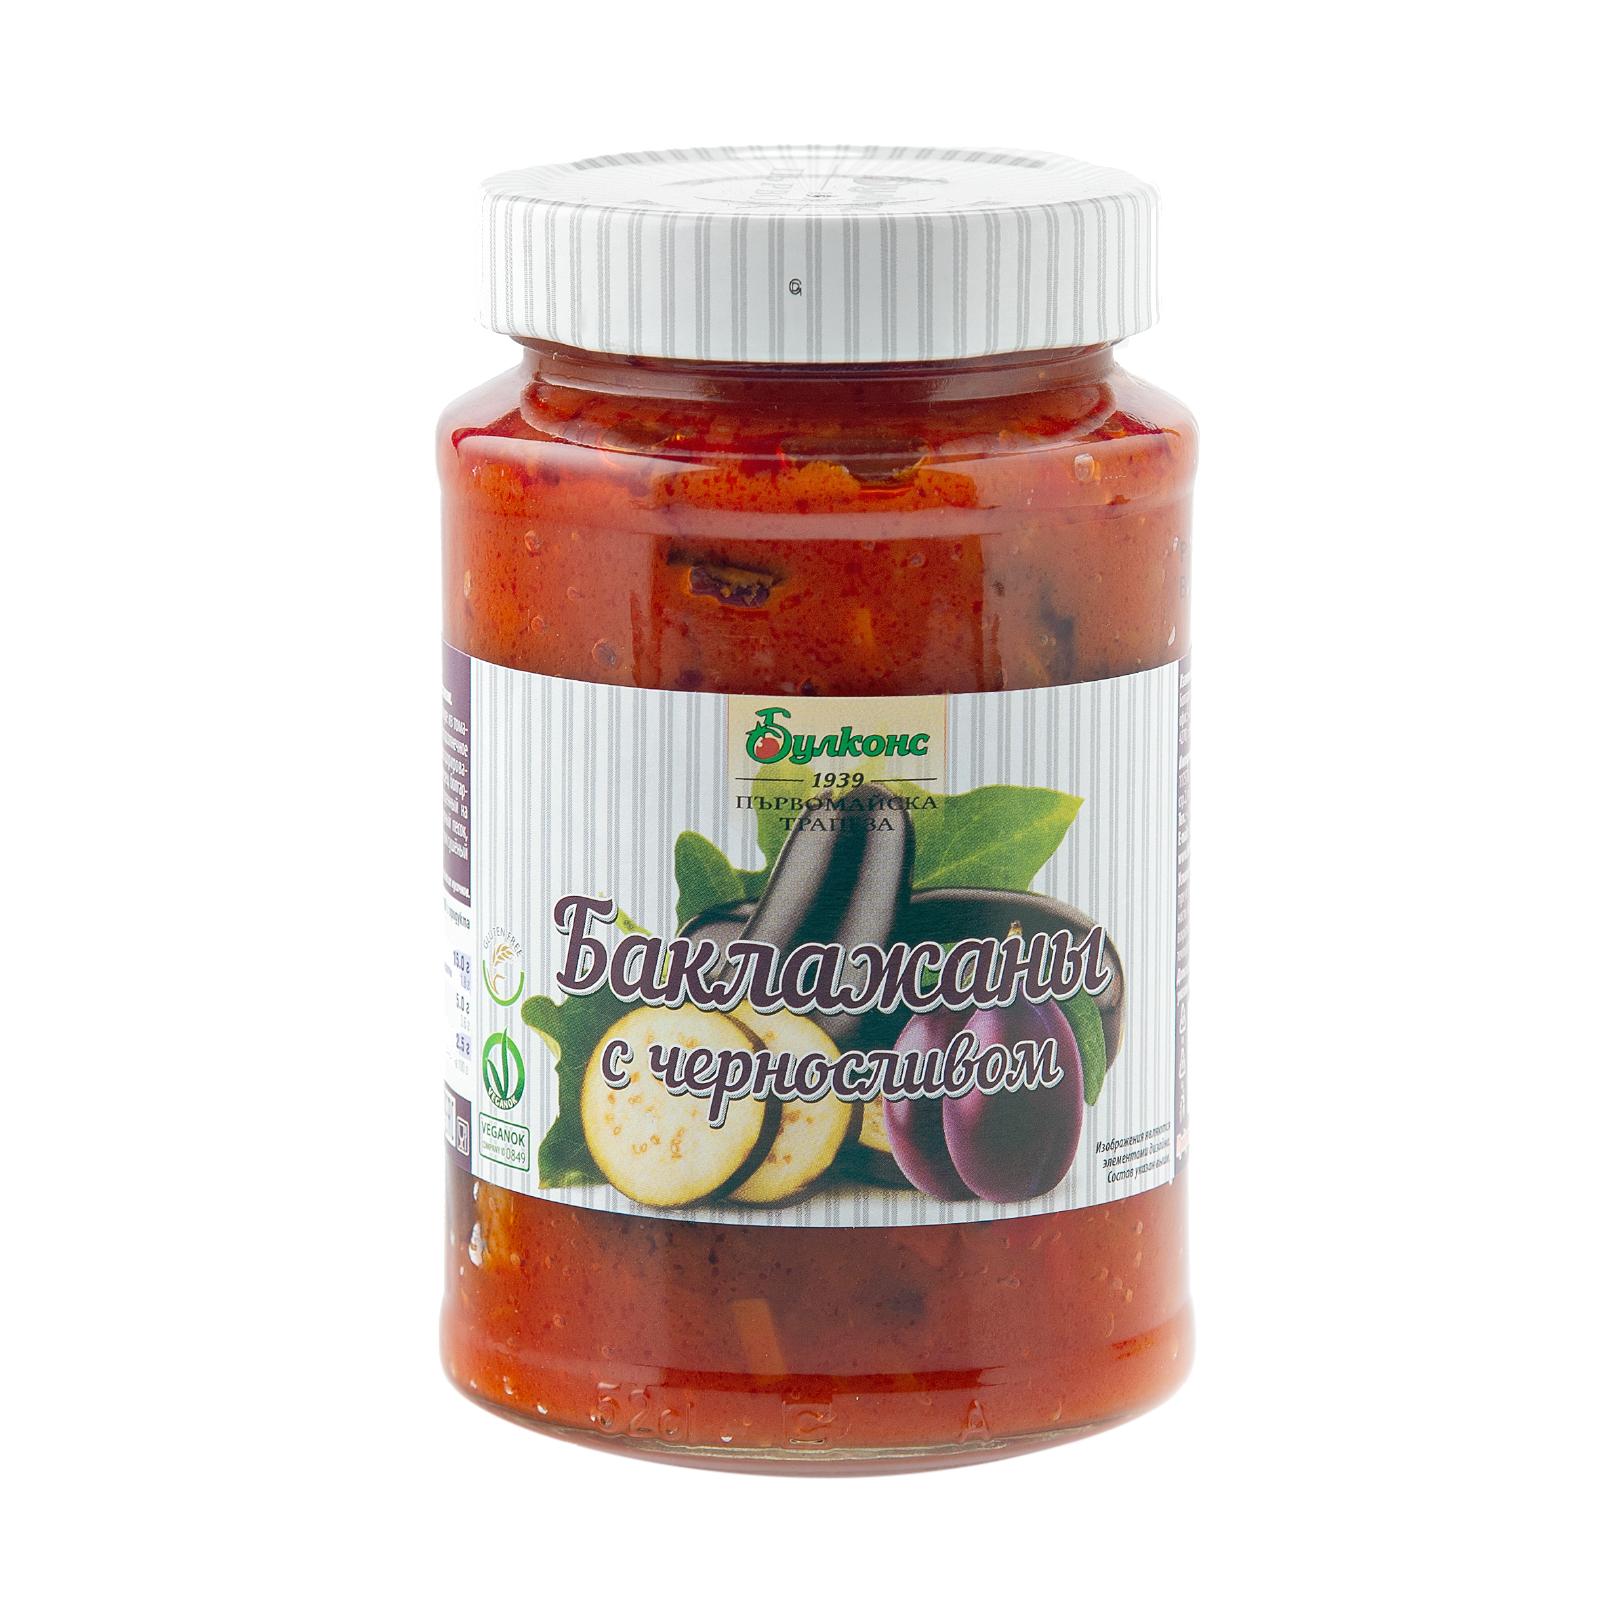 Баклажаны Булконс с черносливом, 470 г баклажаны жареные noyan с черносливом в томатном соусе 560 г